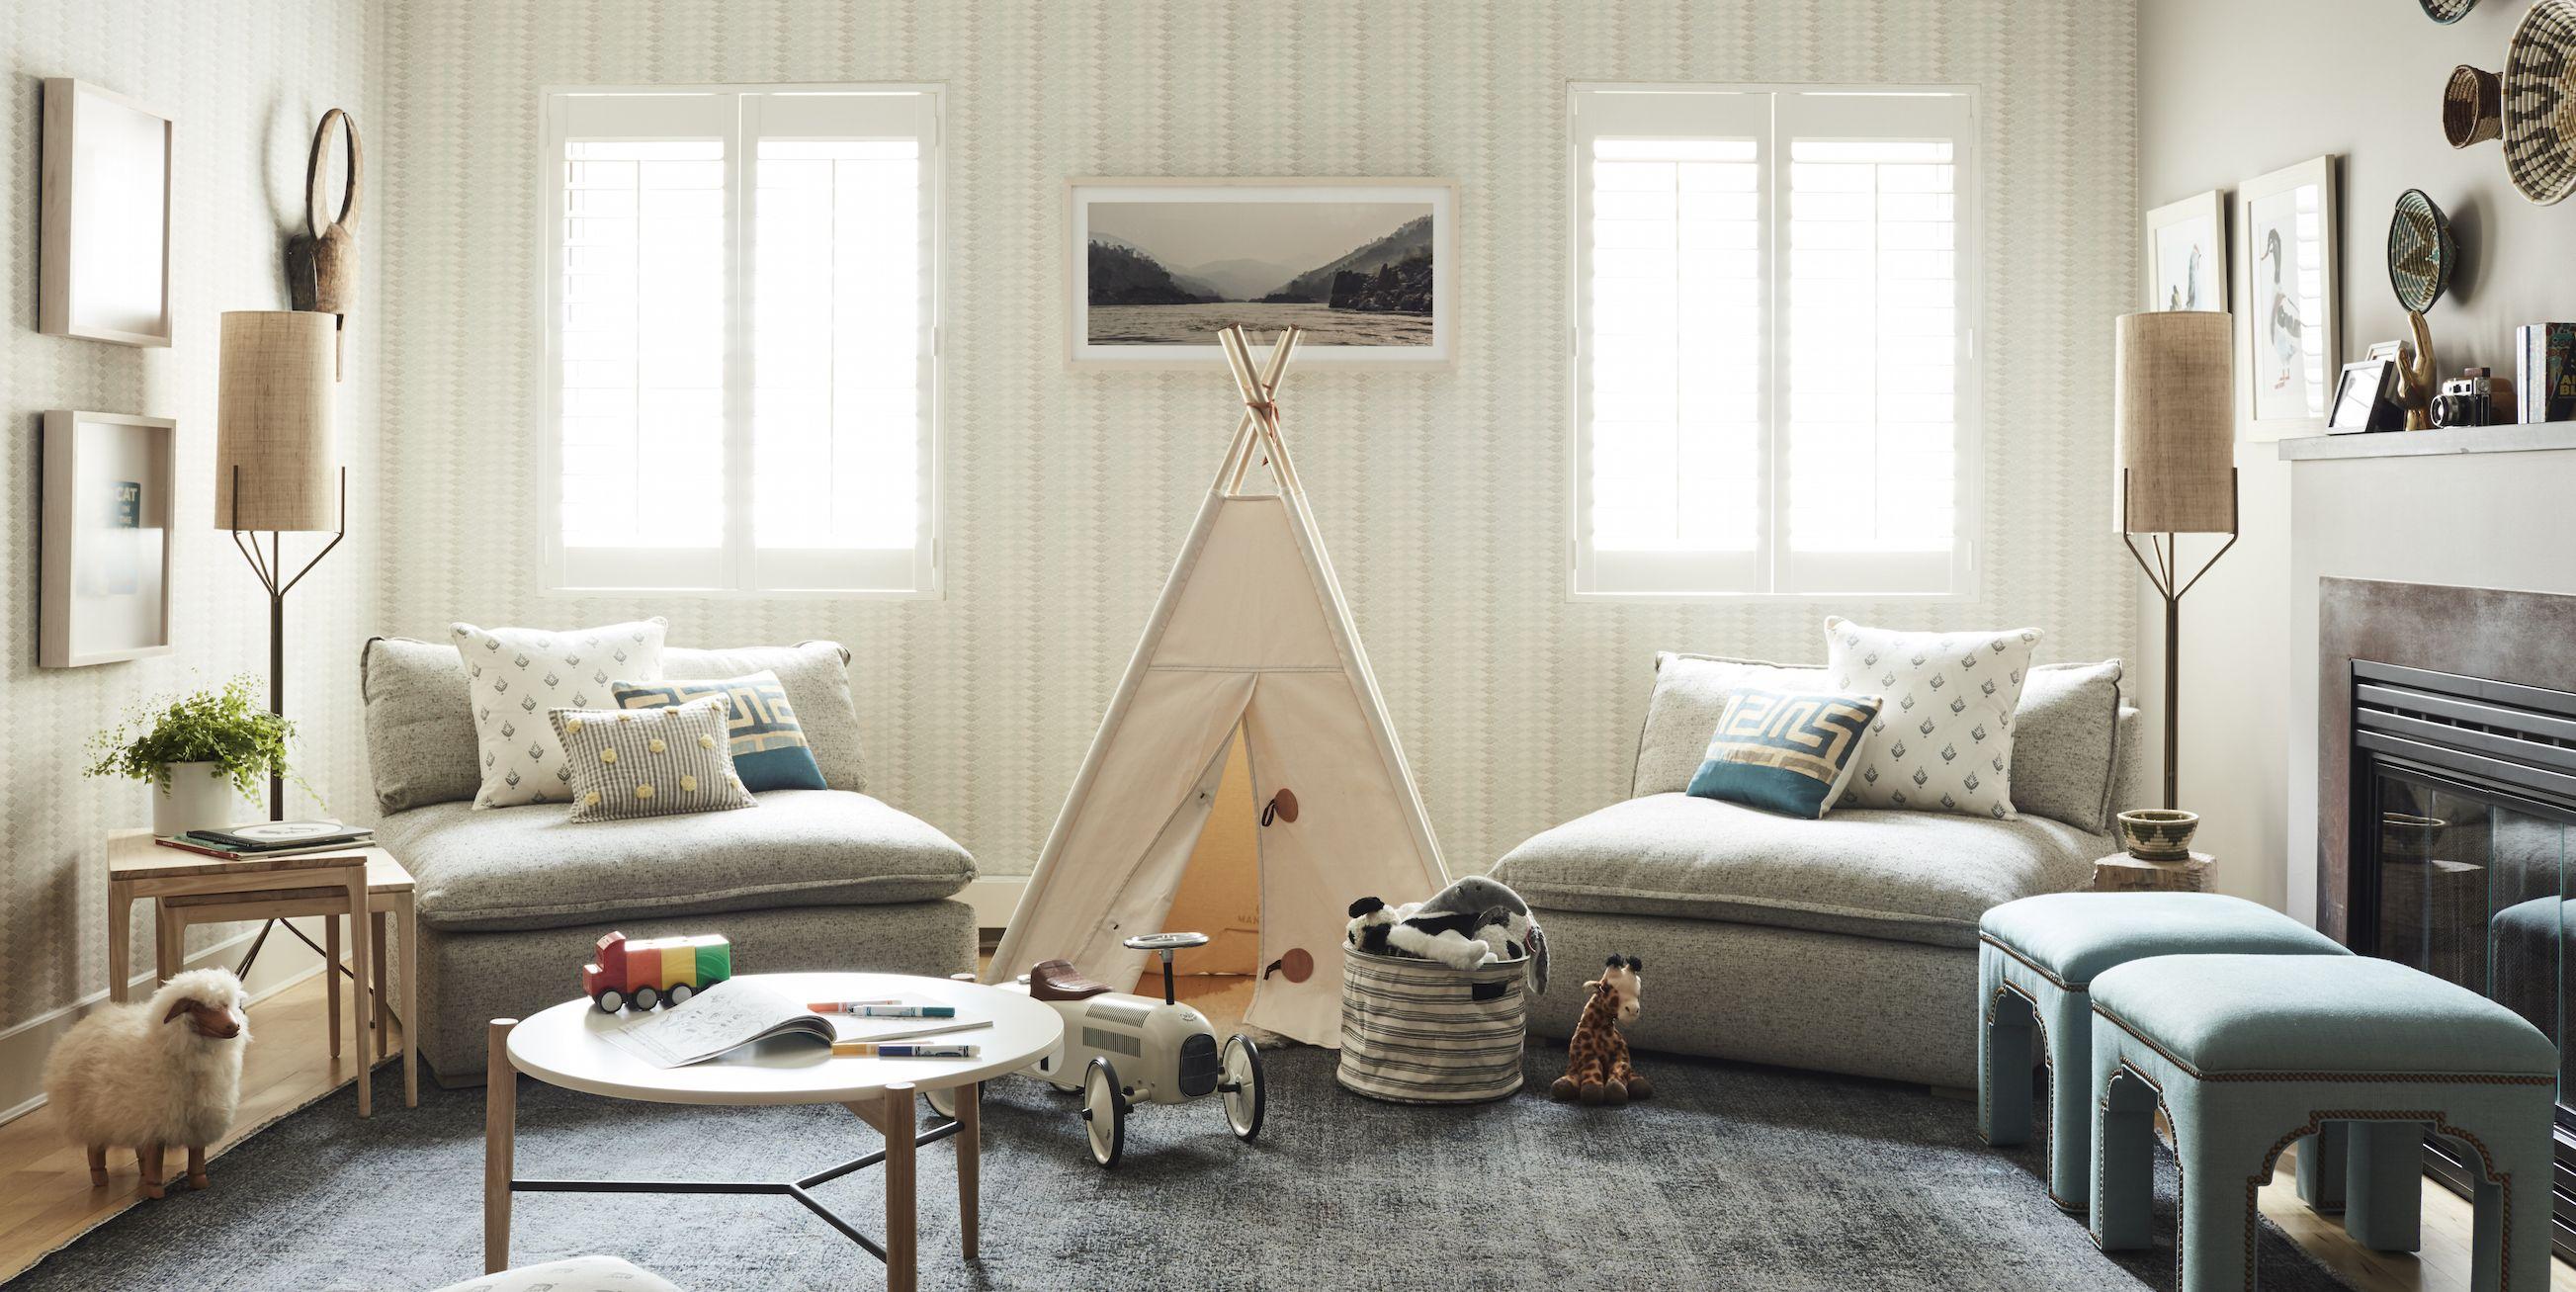 21 Sophisticated Playroom Design Ideas